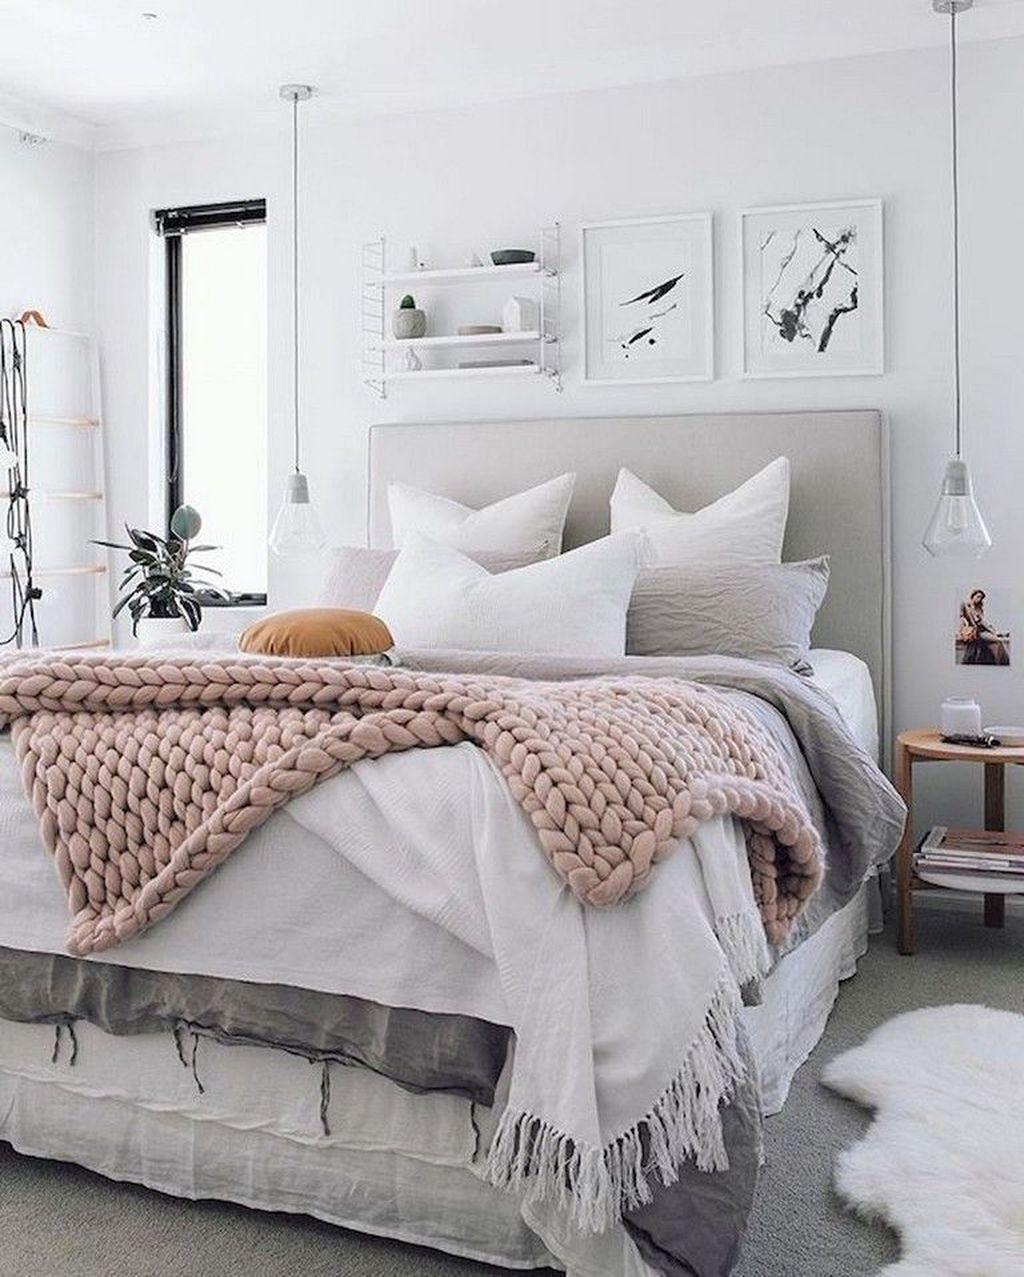 Stunning Bedding Ideas For Cozy Bedroom 30